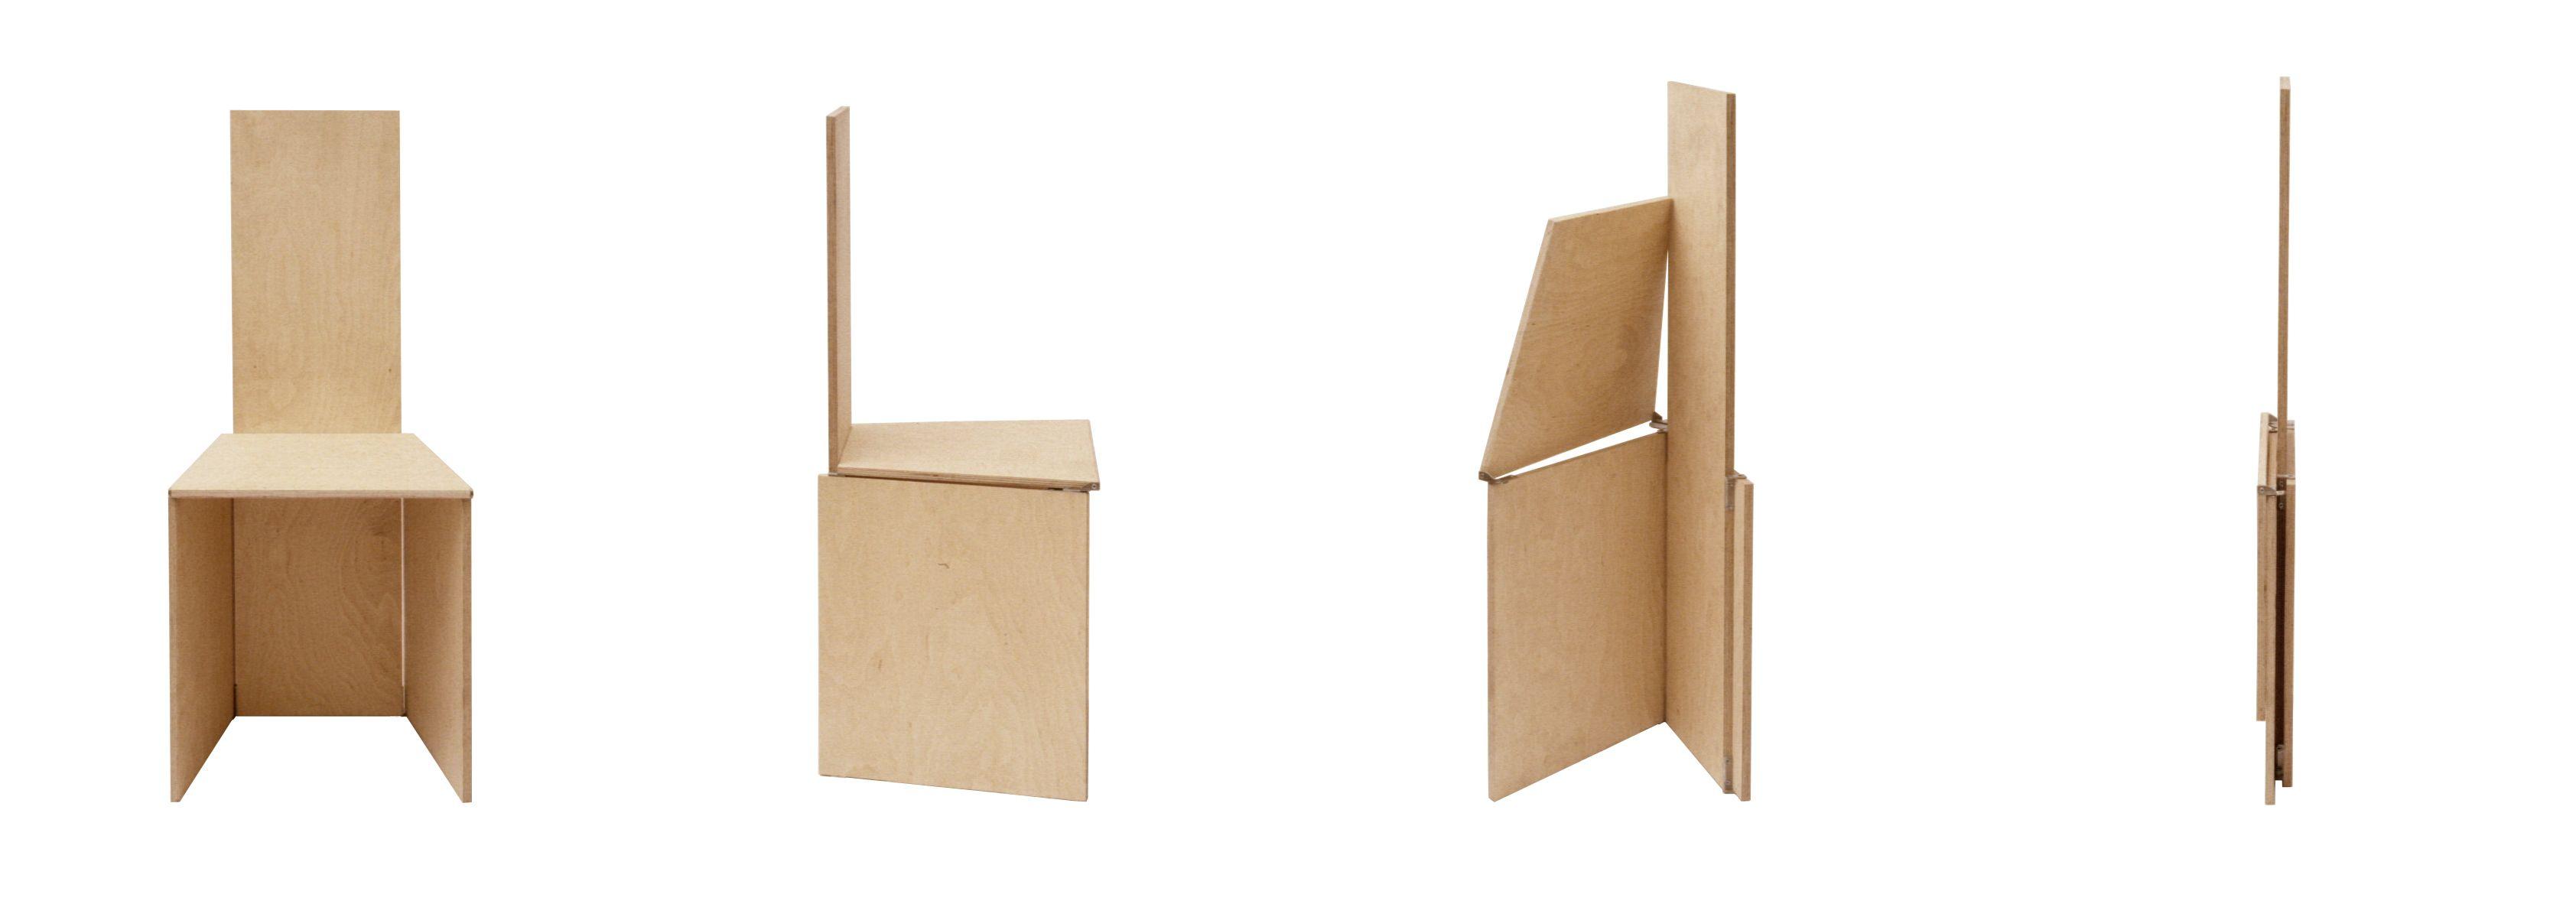 F3 Folding Chair By German Designer Nils Frederking #furnituredesign #birch  #plywood #spacesaver